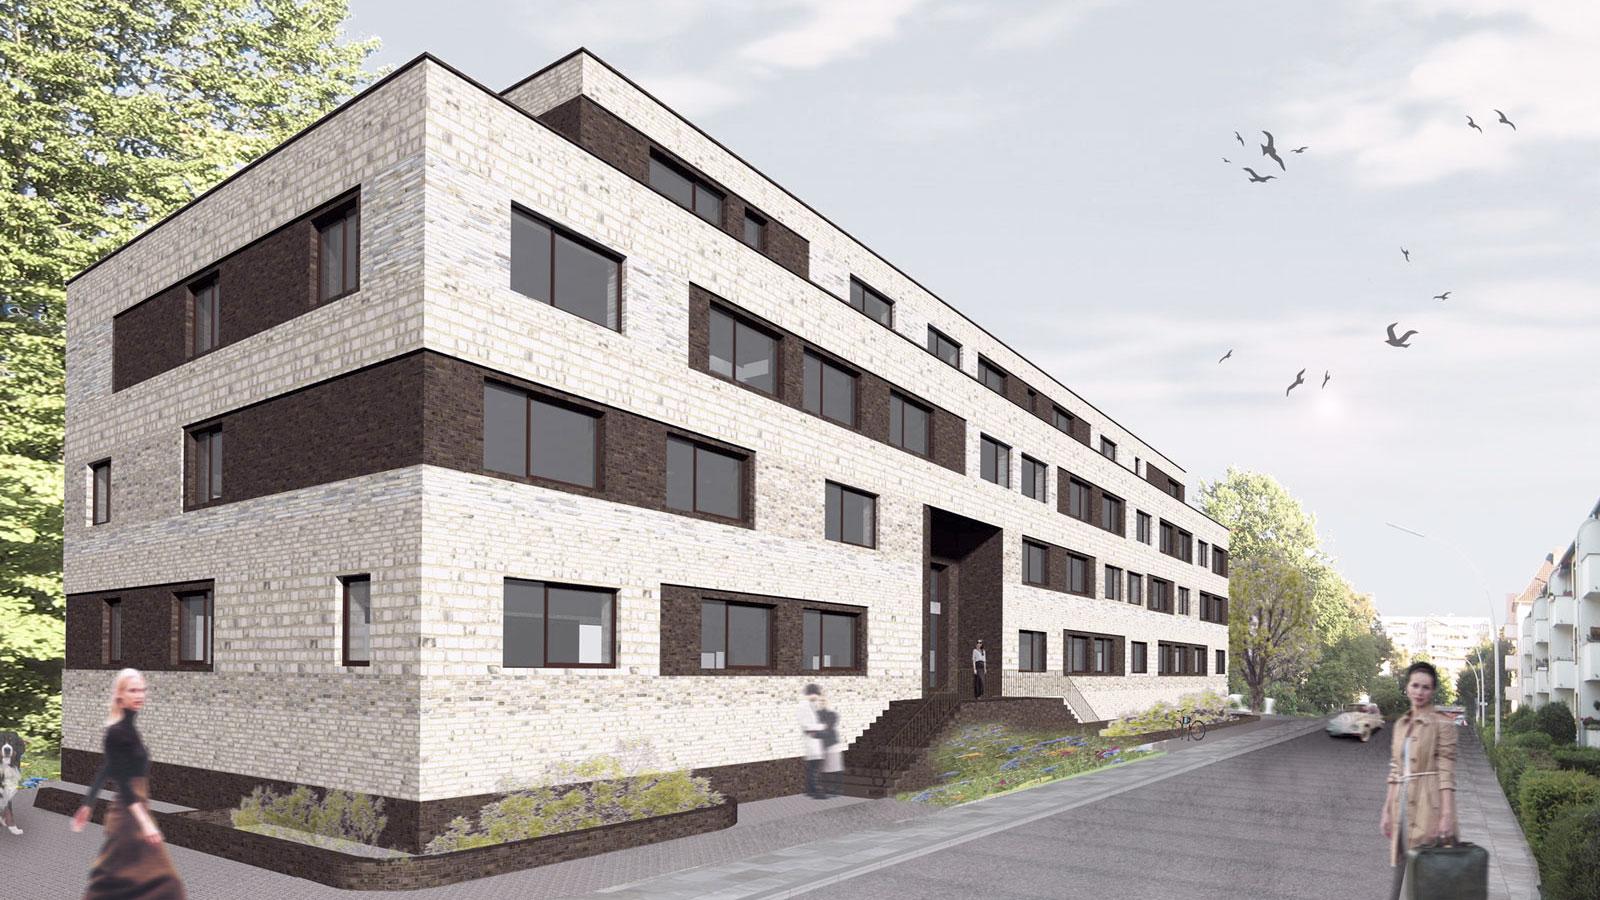 studentenwohnheim drususstra e architekturb ro koenigs. Black Bedroom Furniture Sets. Home Design Ideas